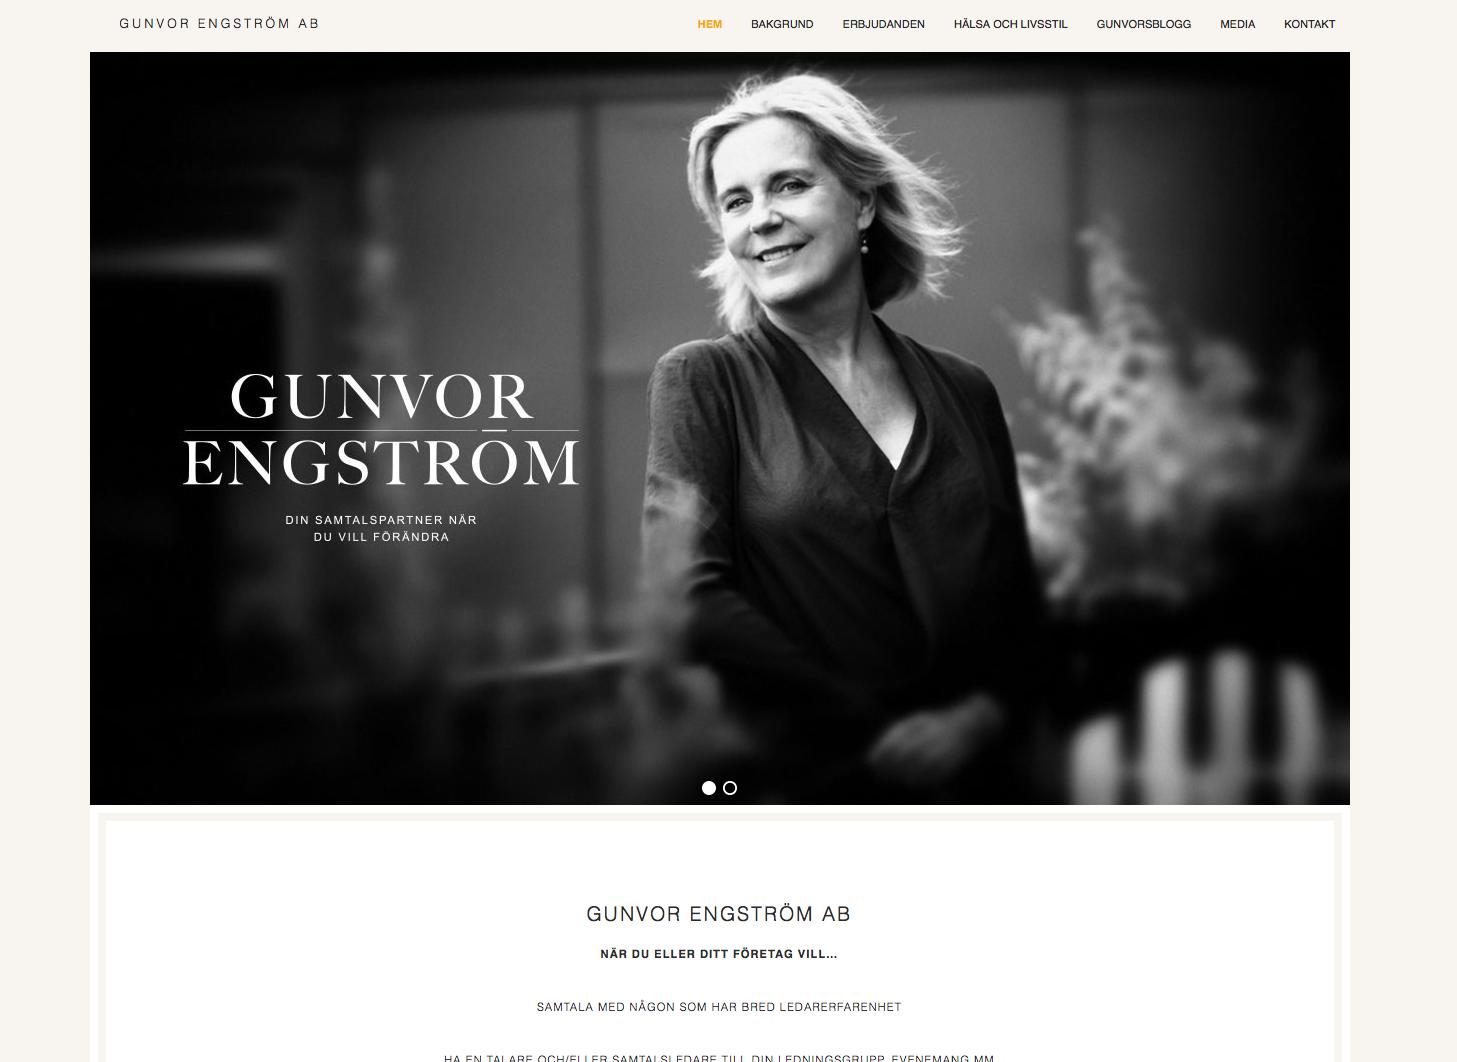 Gunvor Engström AB